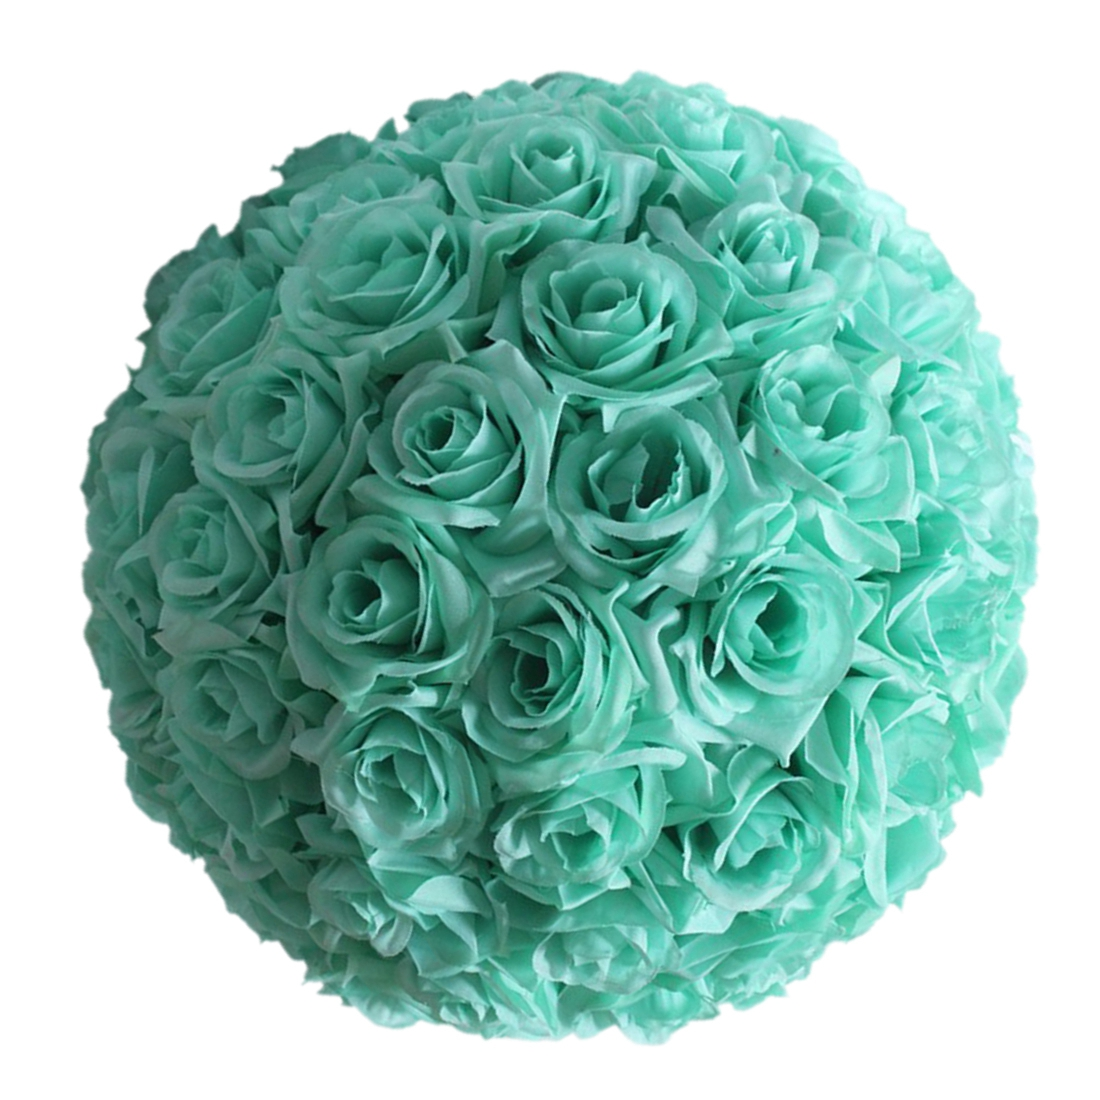 820cm wedding artificial rose silk flower ball mint hanging 8 034 20cm wedding artificial rose silk flower mightylinksfo Images